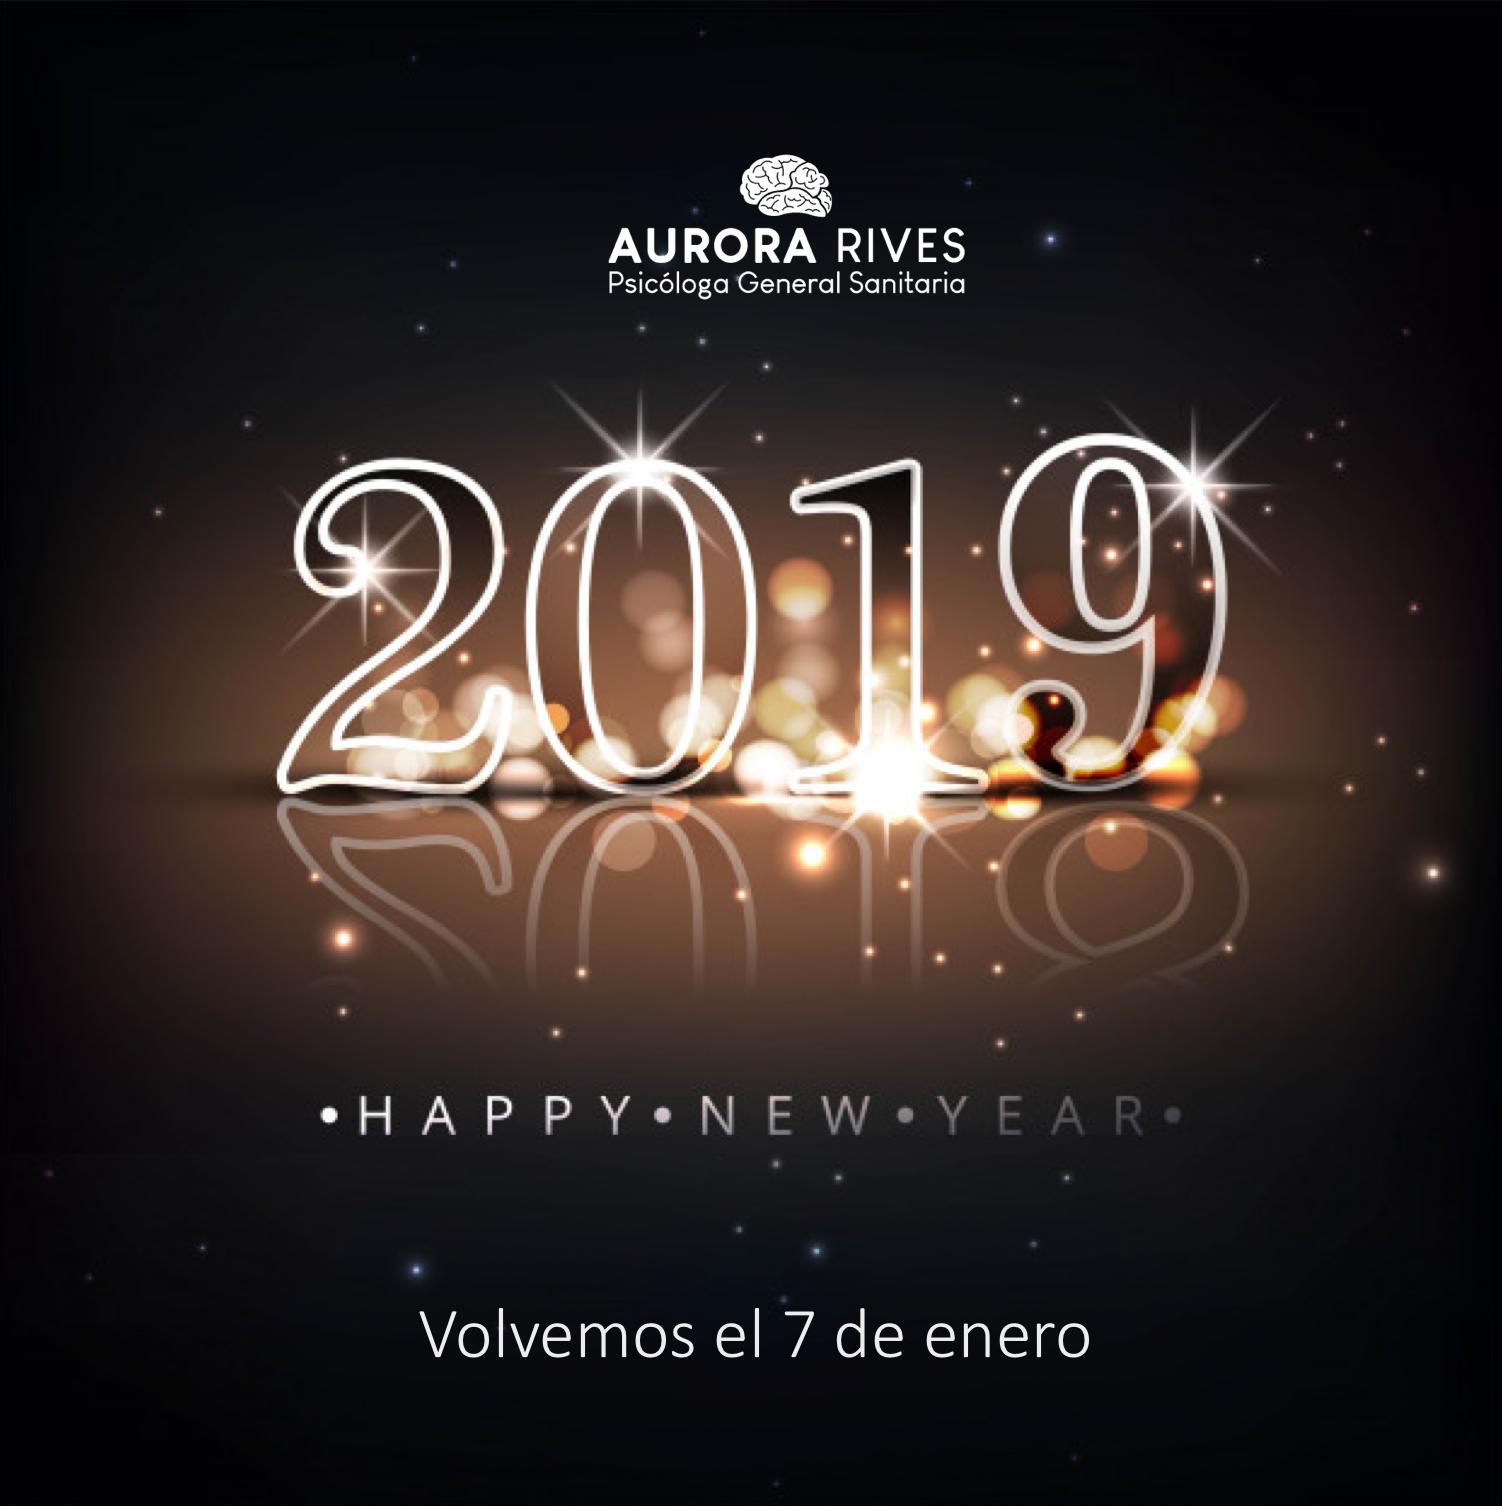 Feliz 2019 Aurora Rives